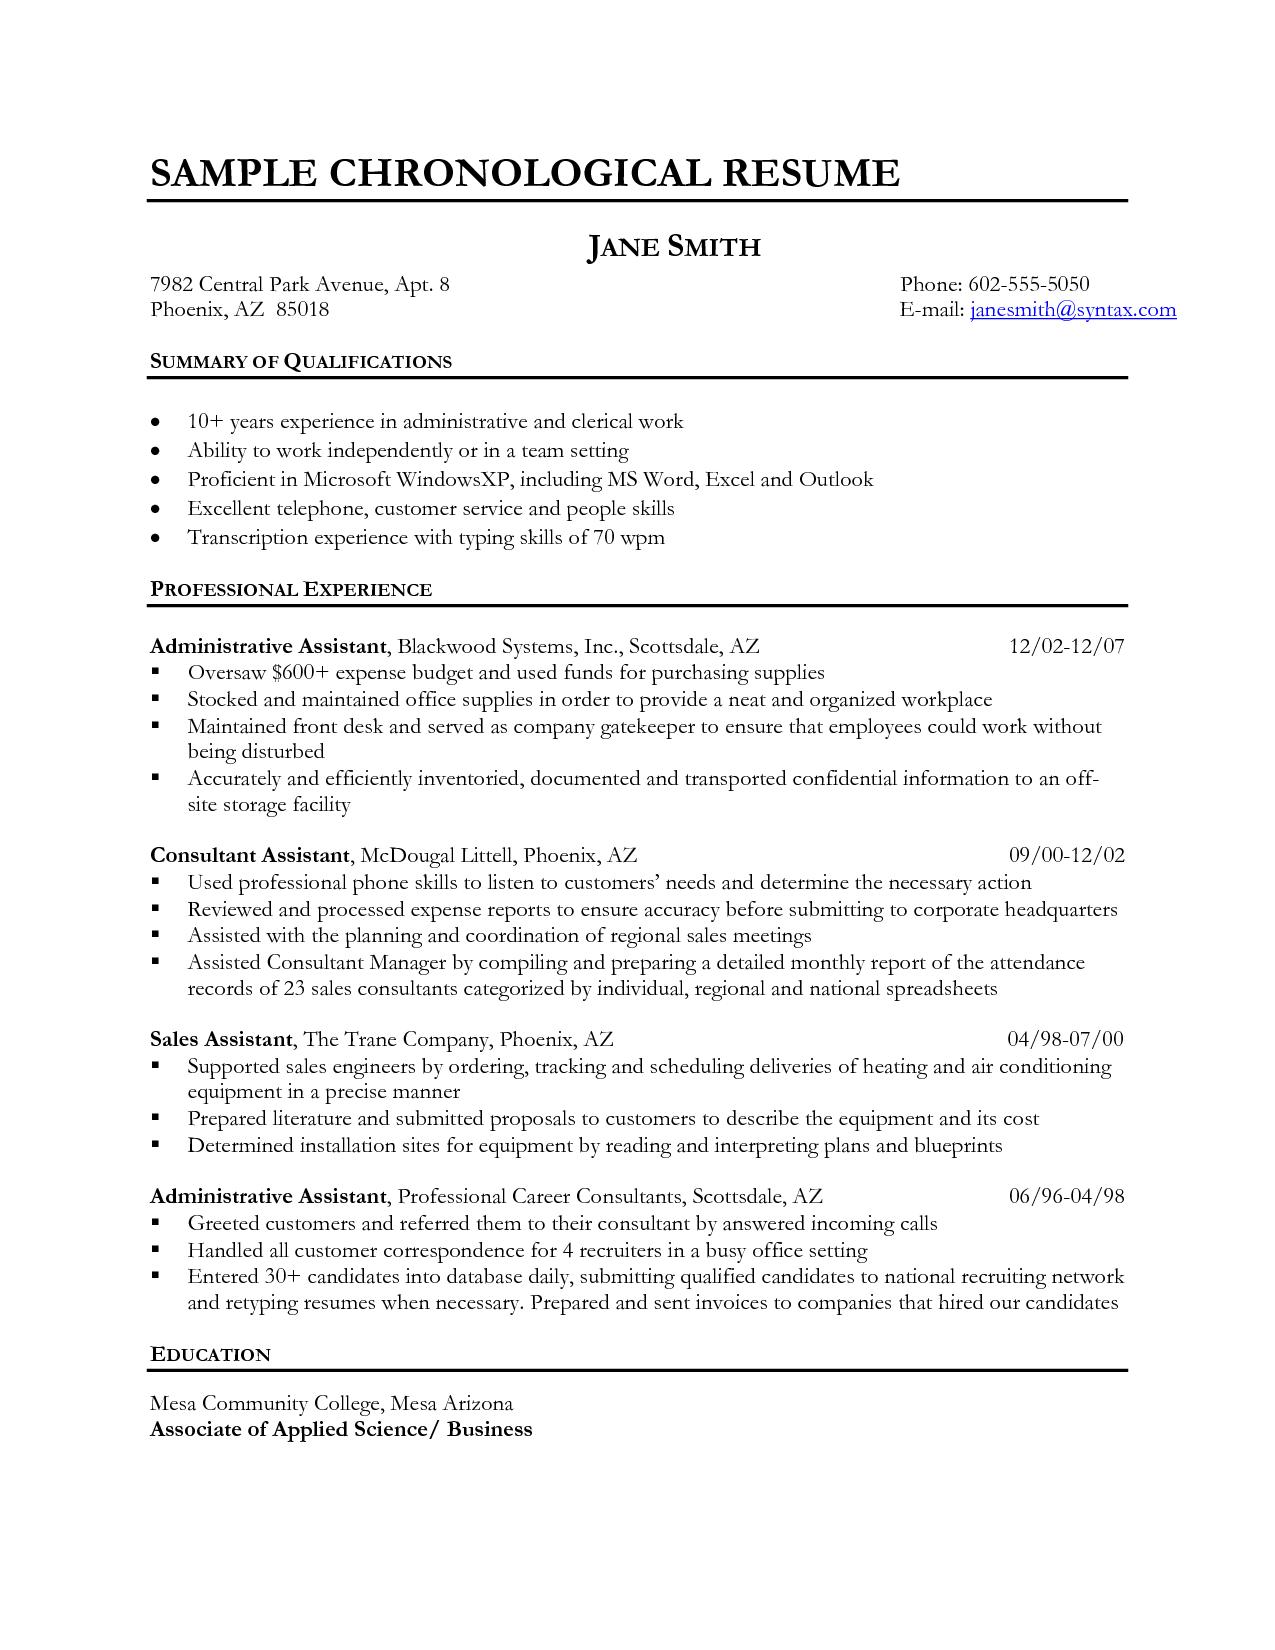 Front_Desk_Receptionist_Skills_Medical_Office_Resume.jpg